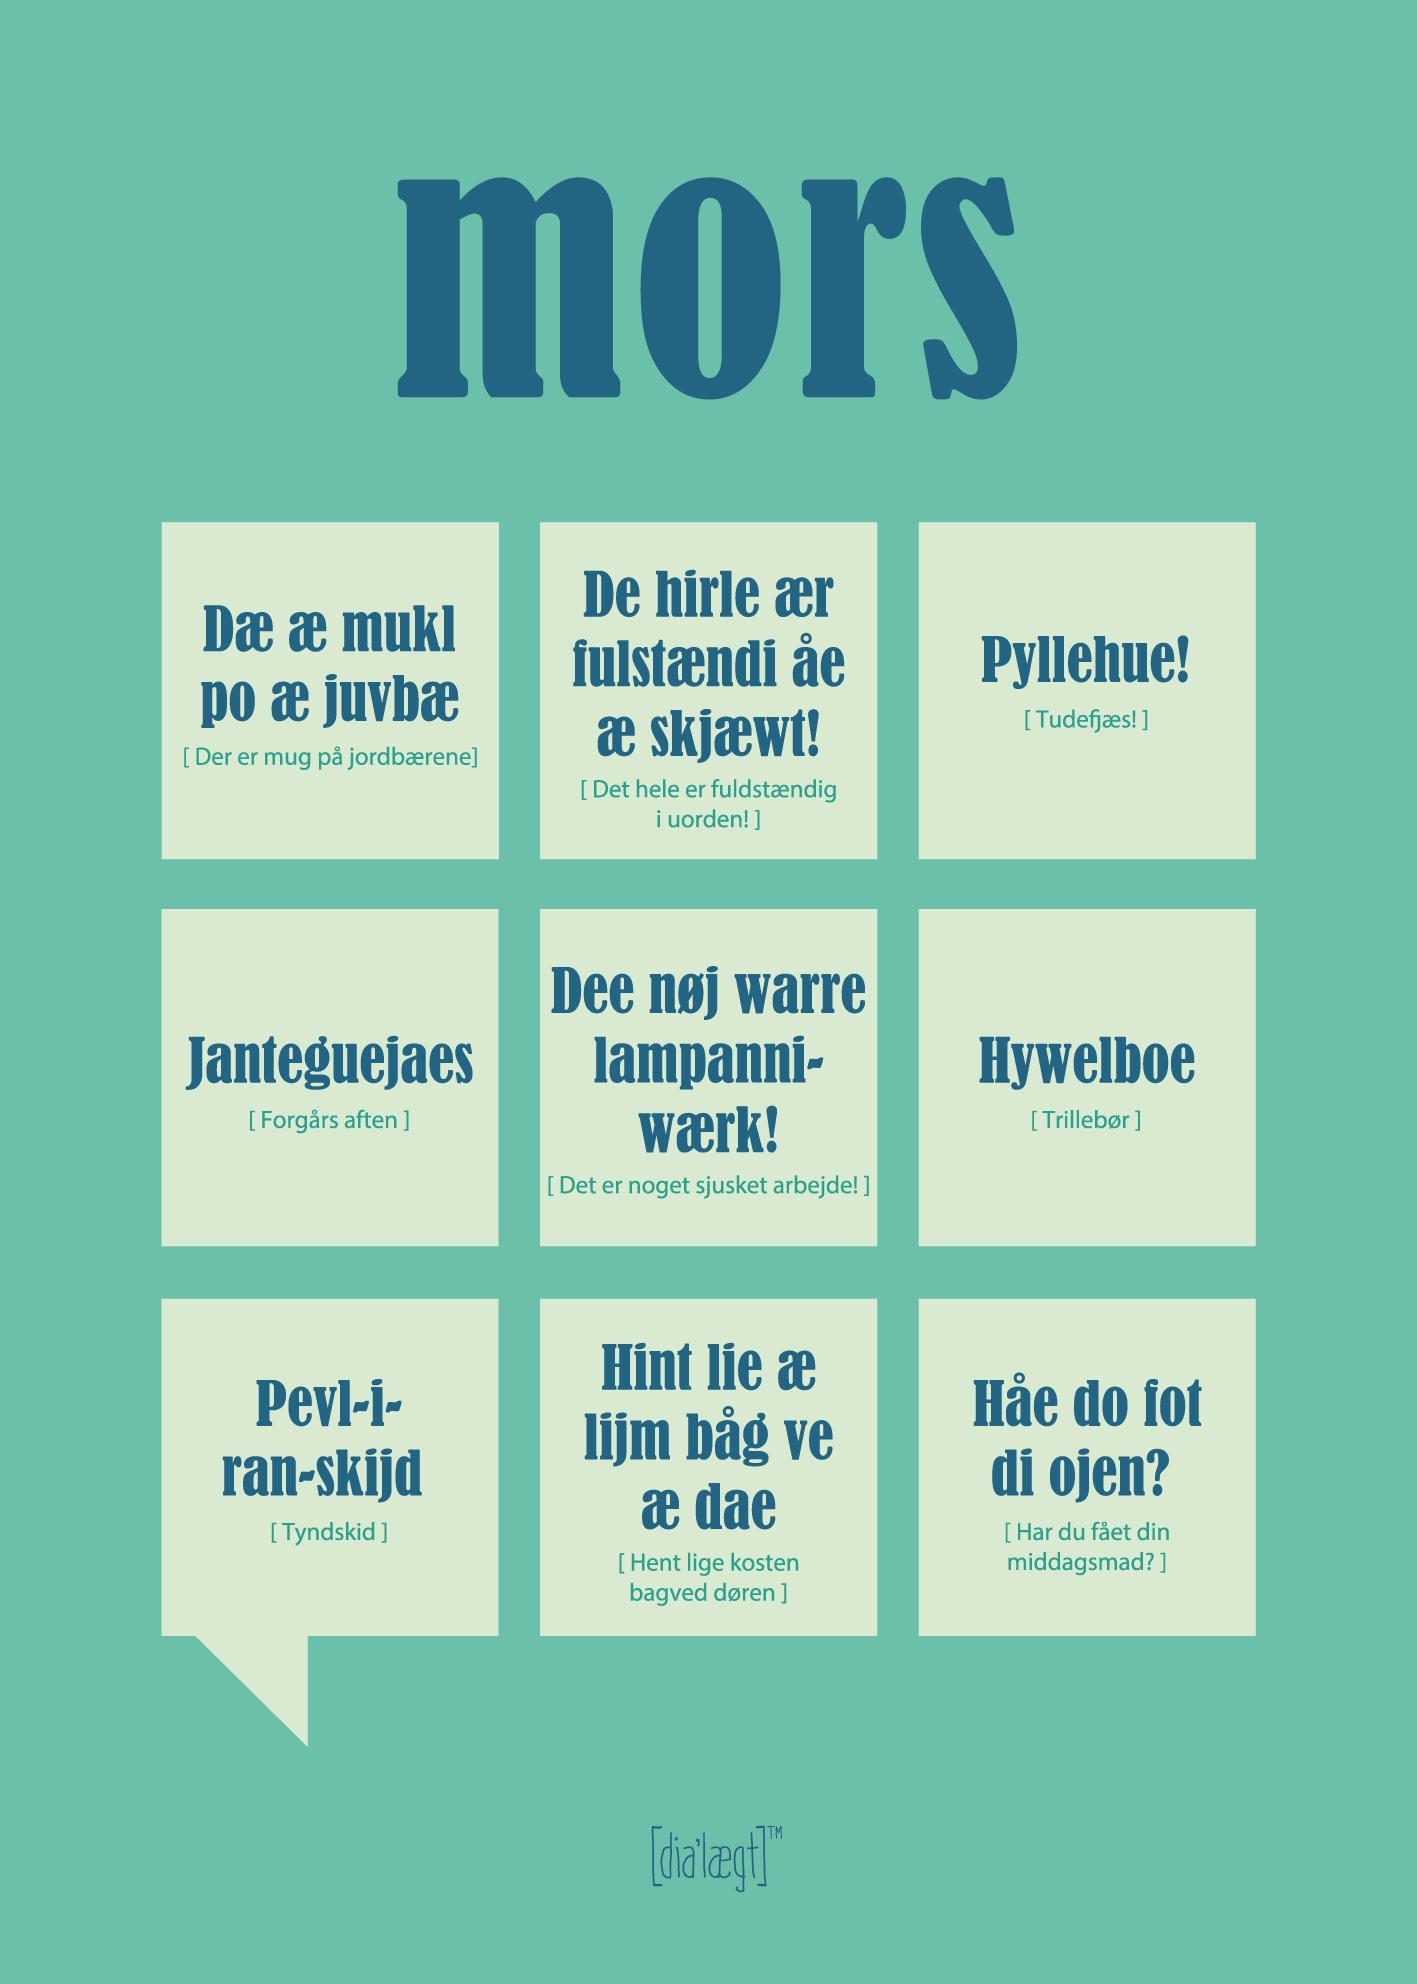 citater til mor Plakat med citater fra Mors citater til mor